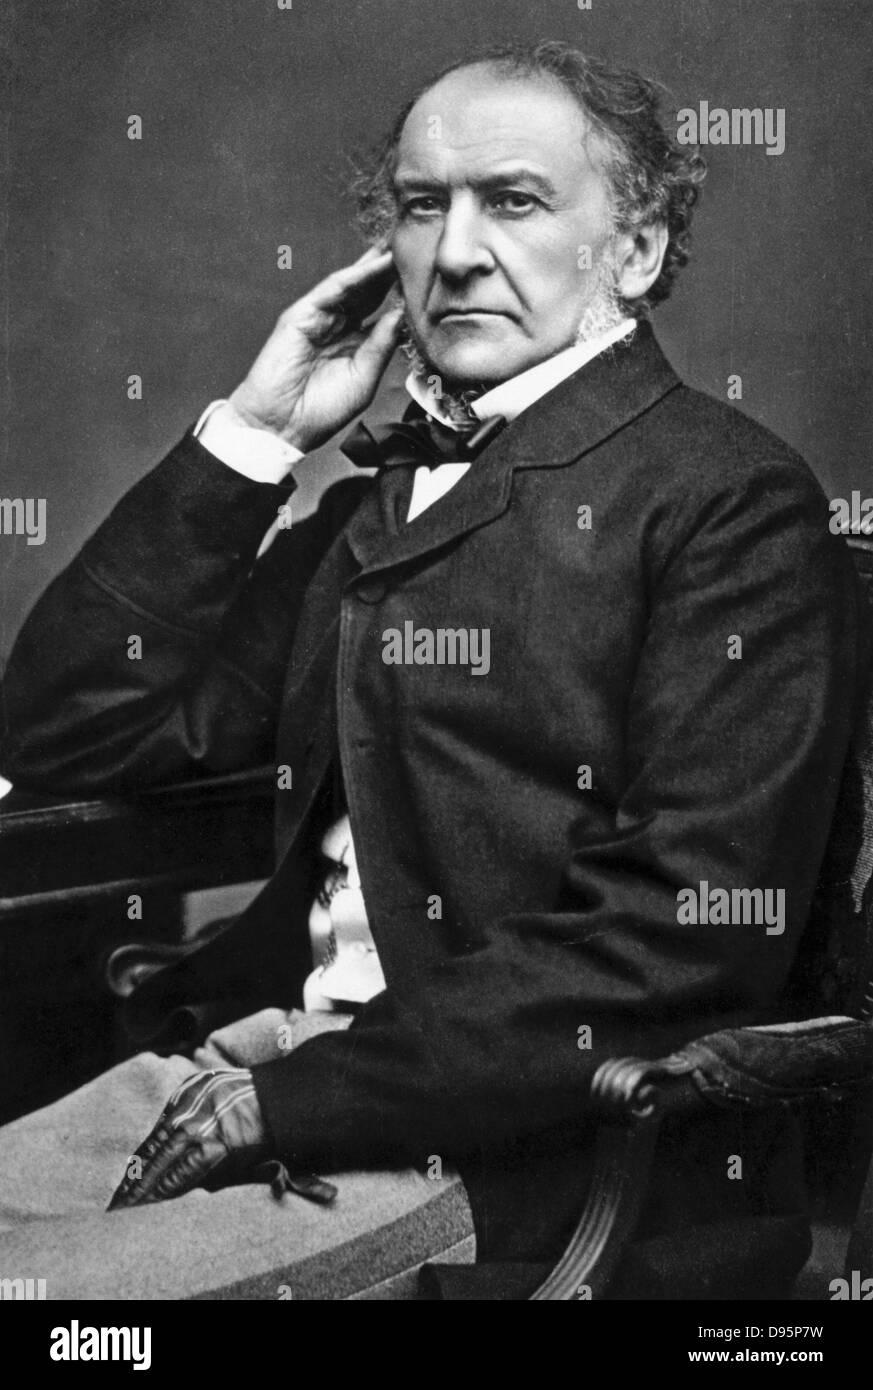 William Ewart Gladstone (1809-1898) British Liberal statesman. Photograph. - Stock Image